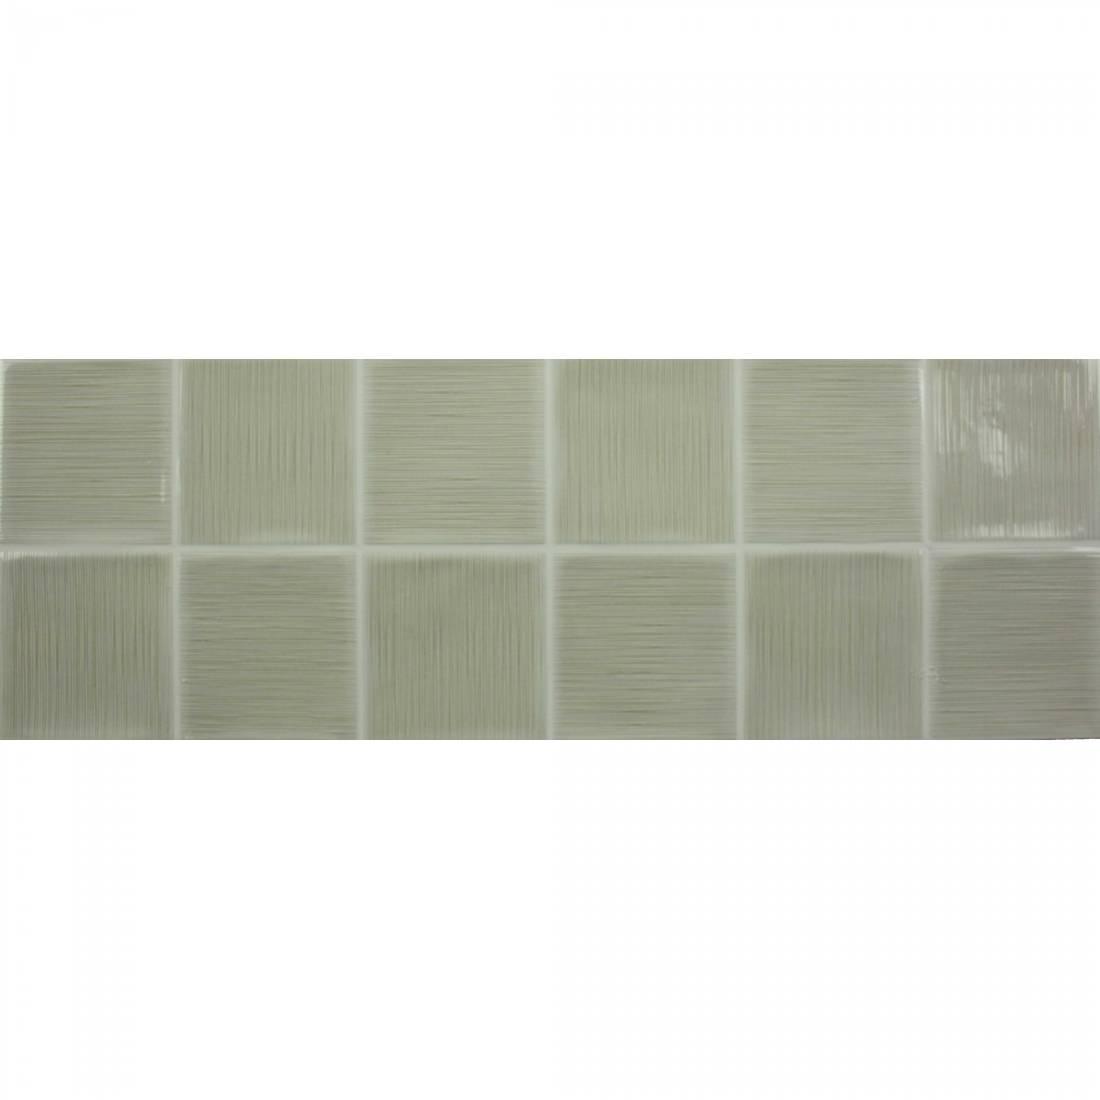 Arlette Decor 21.4x61 Vision Gloss 1